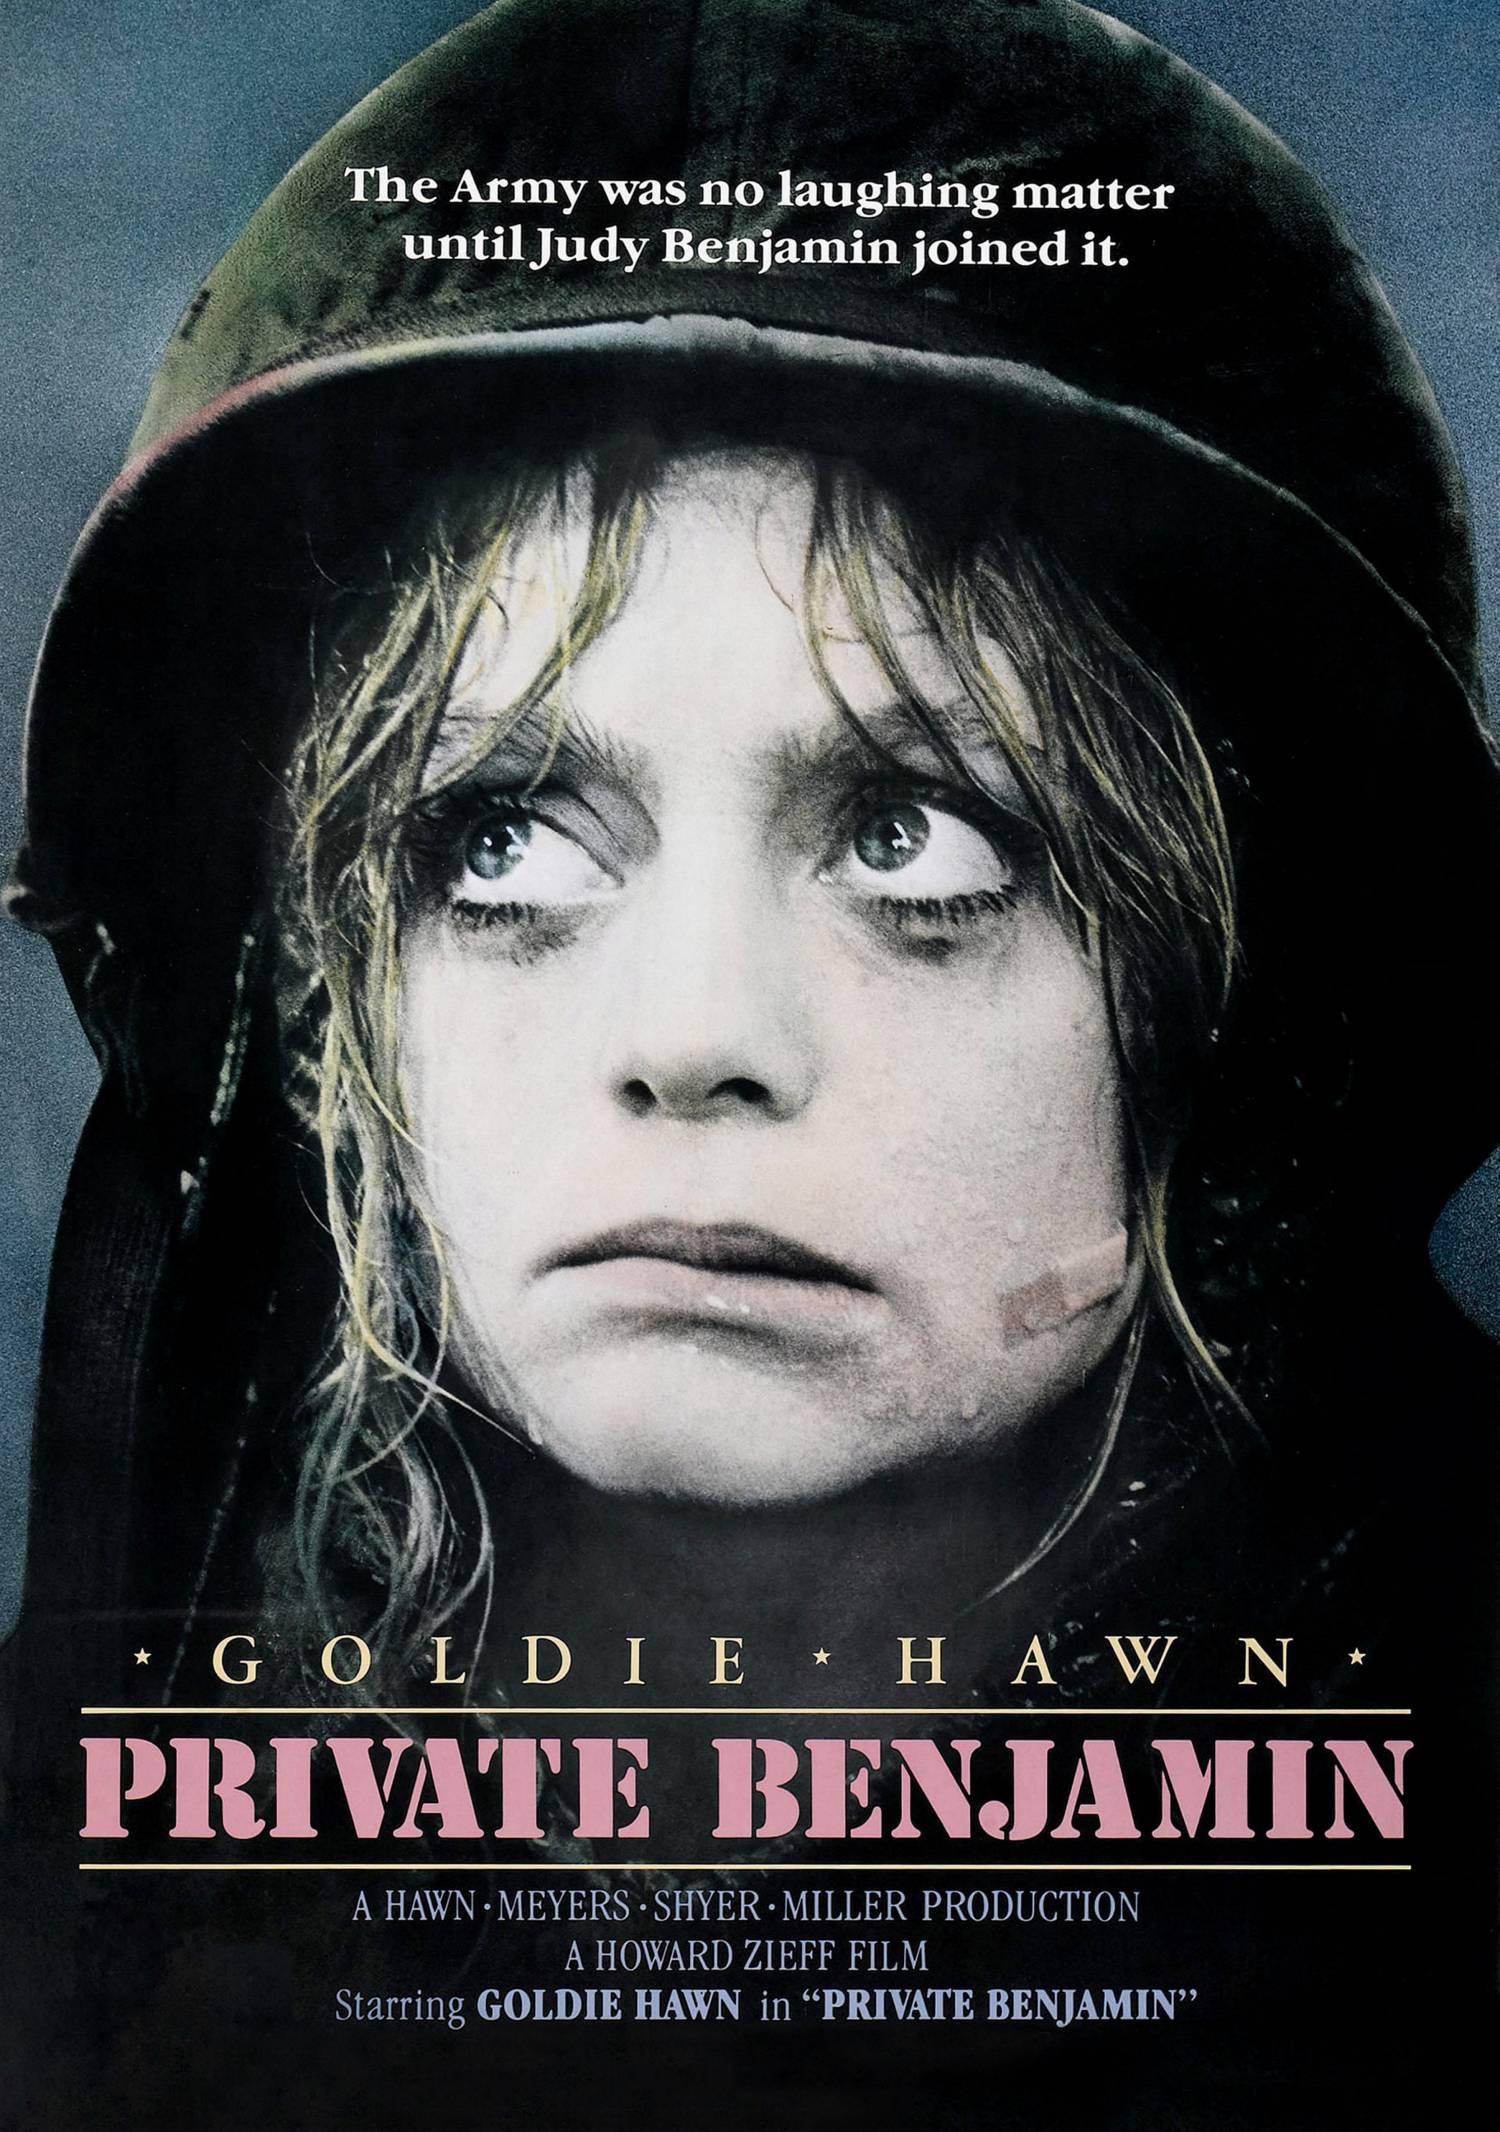 """Private Benjamin"", 1980 American comedy film starring Goldie Hawn."